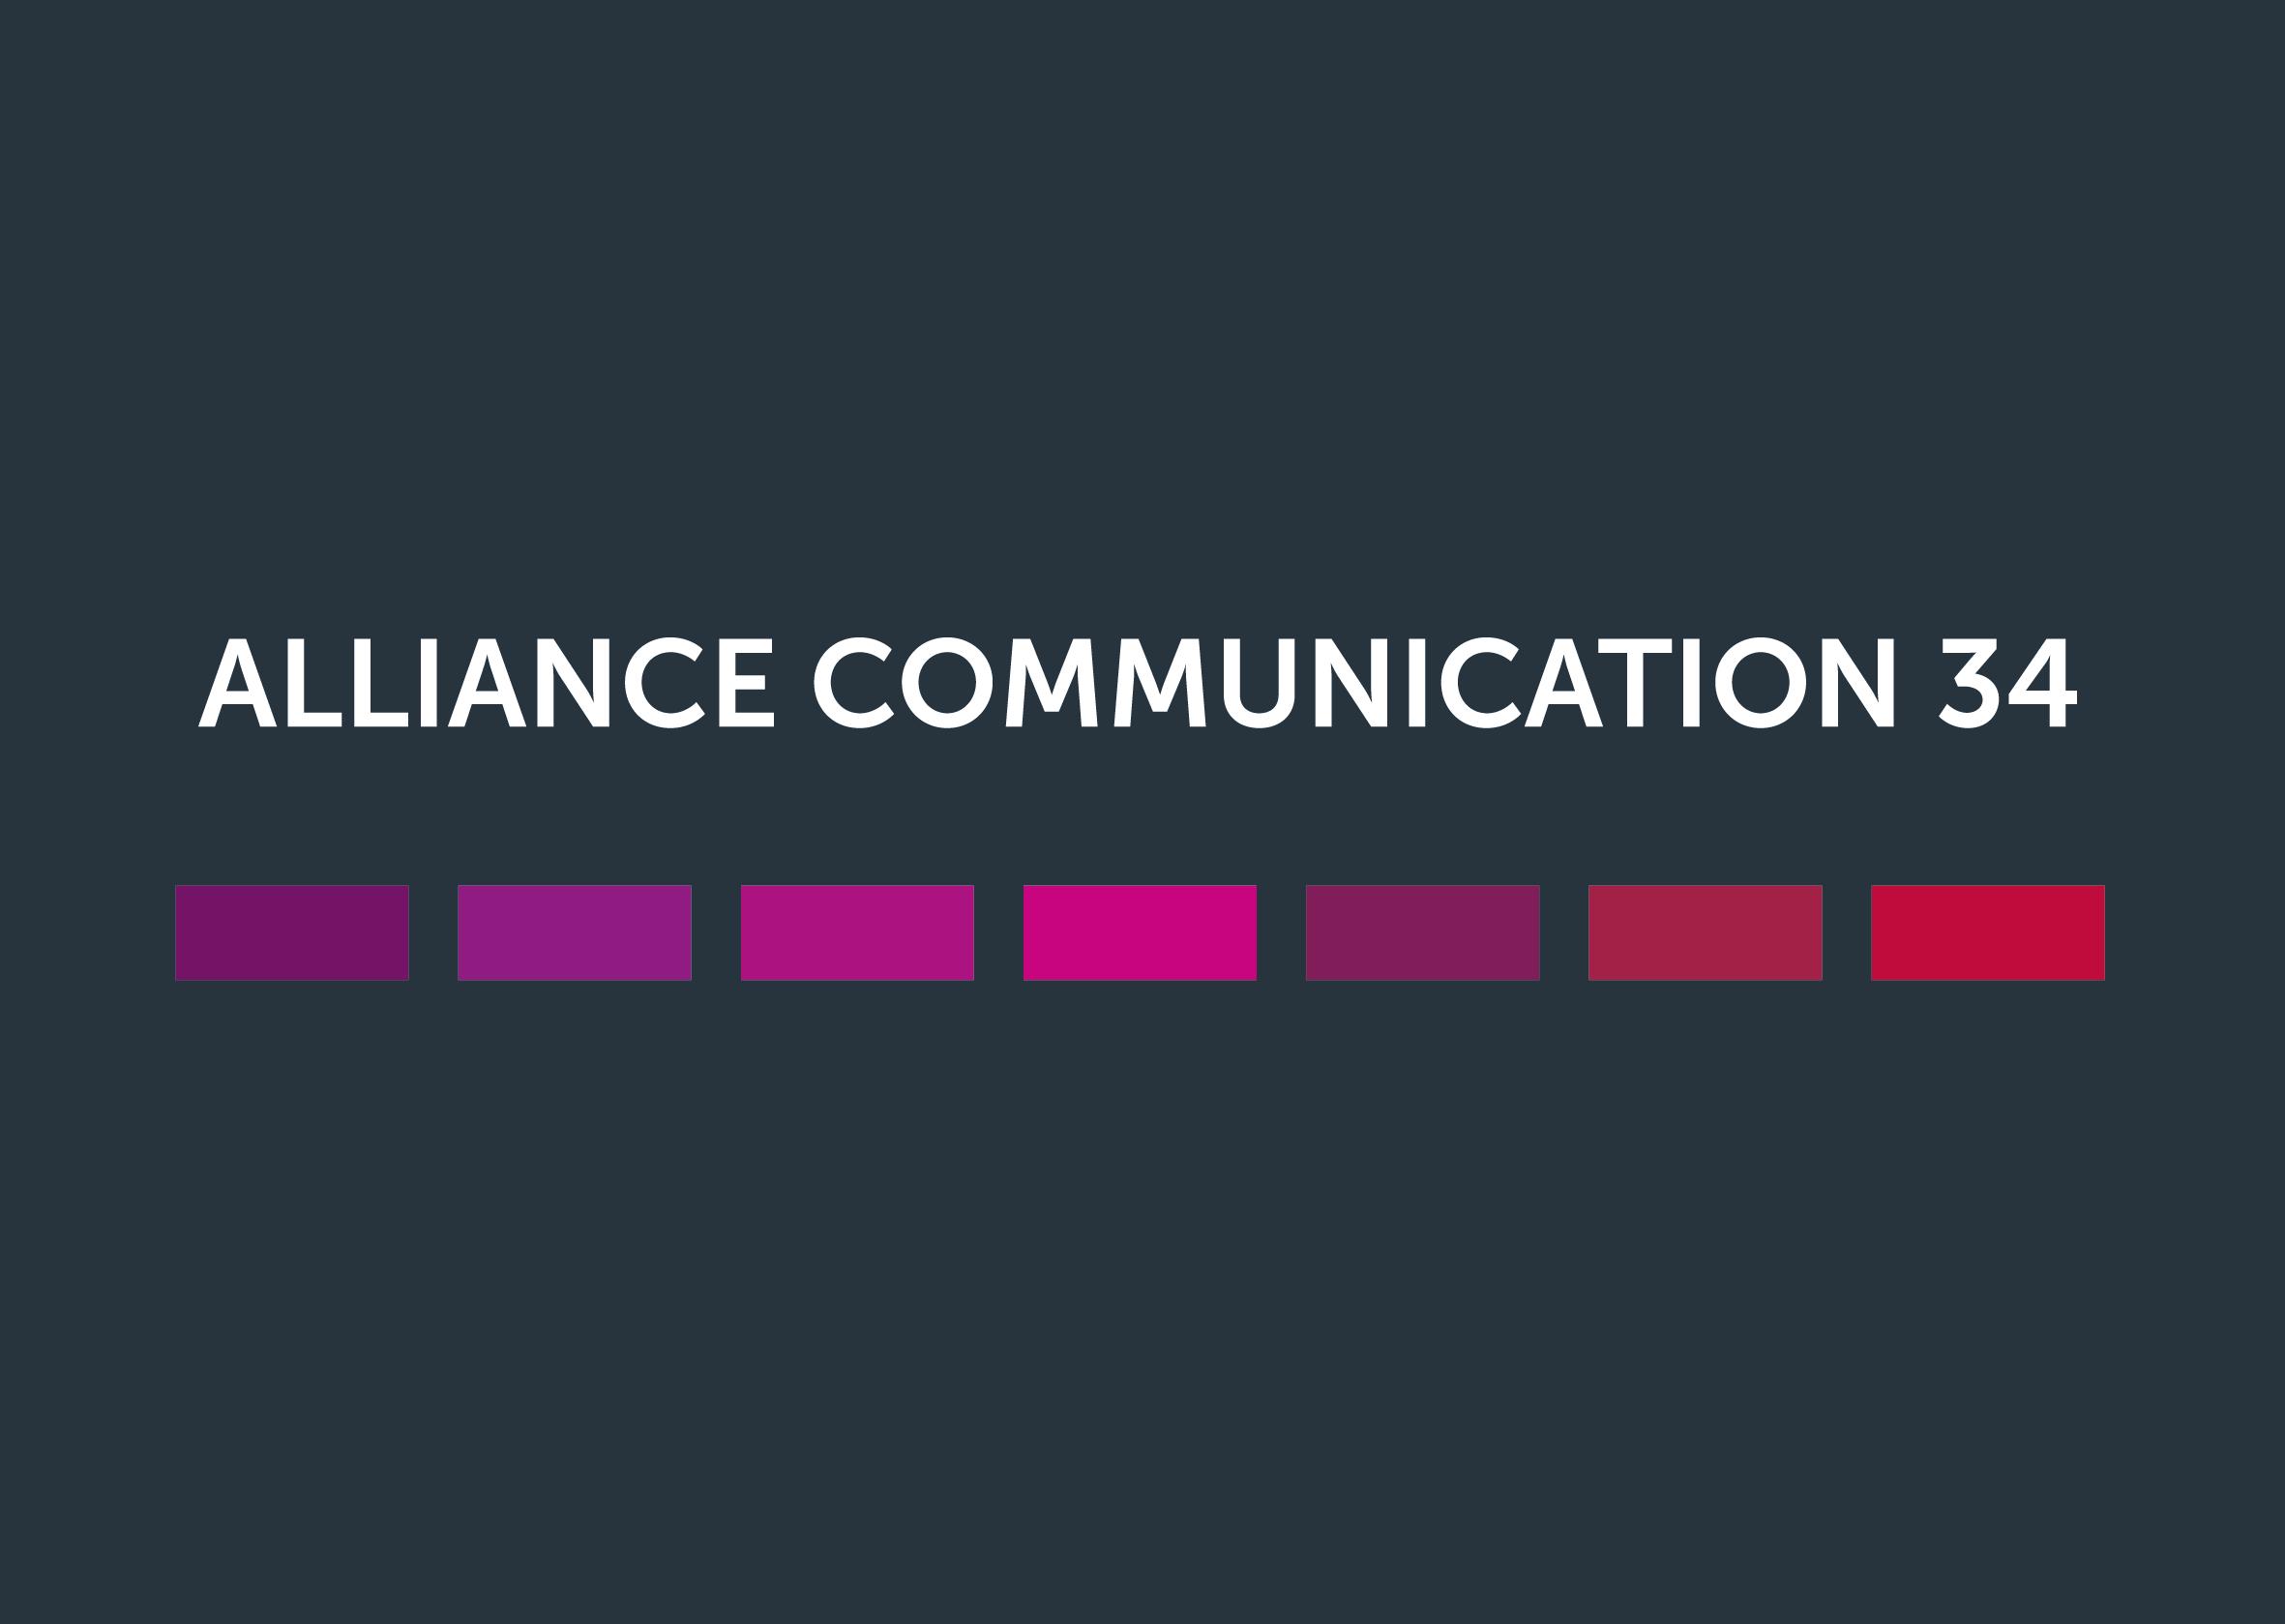 Alliance Communication 34